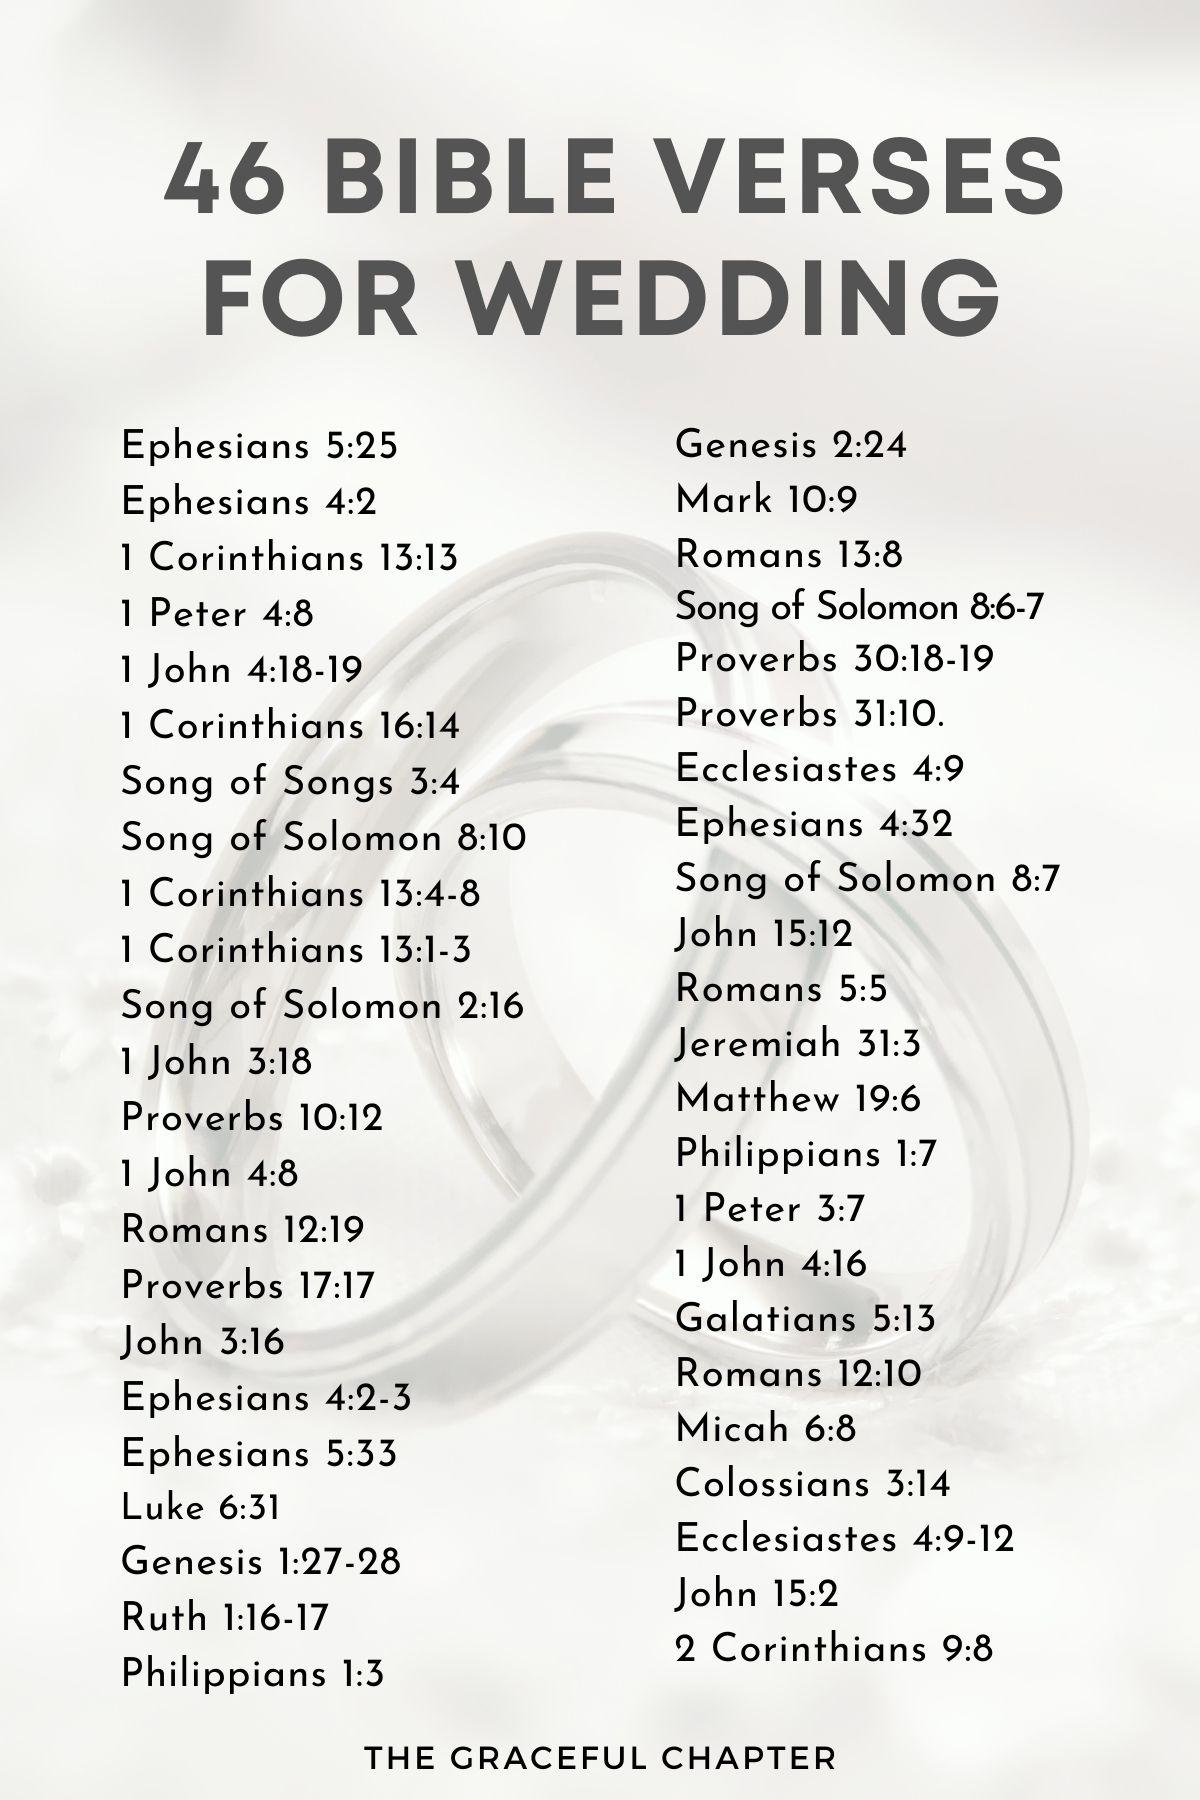 40 bible verses for wedding